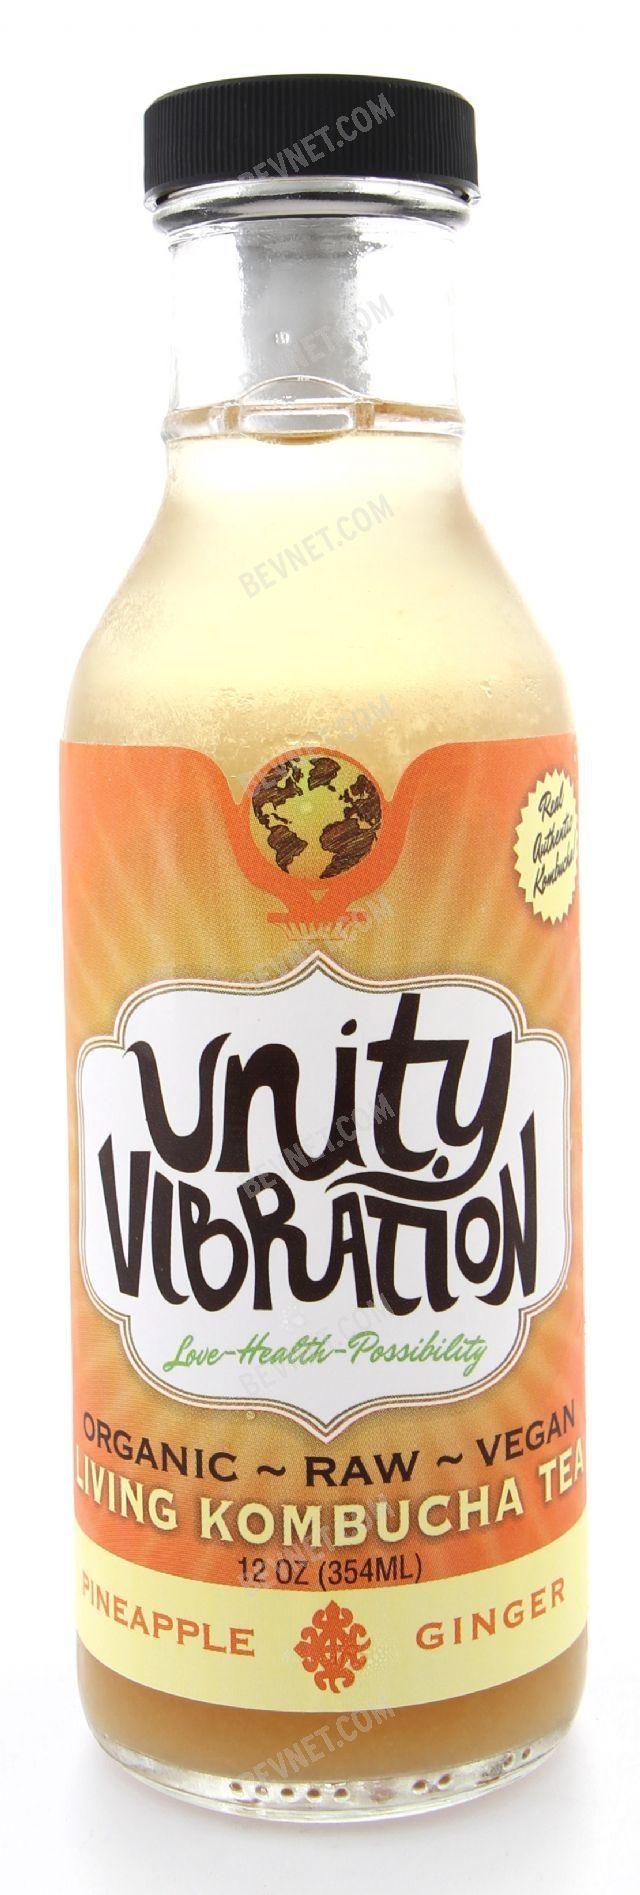 Unity Vibration: